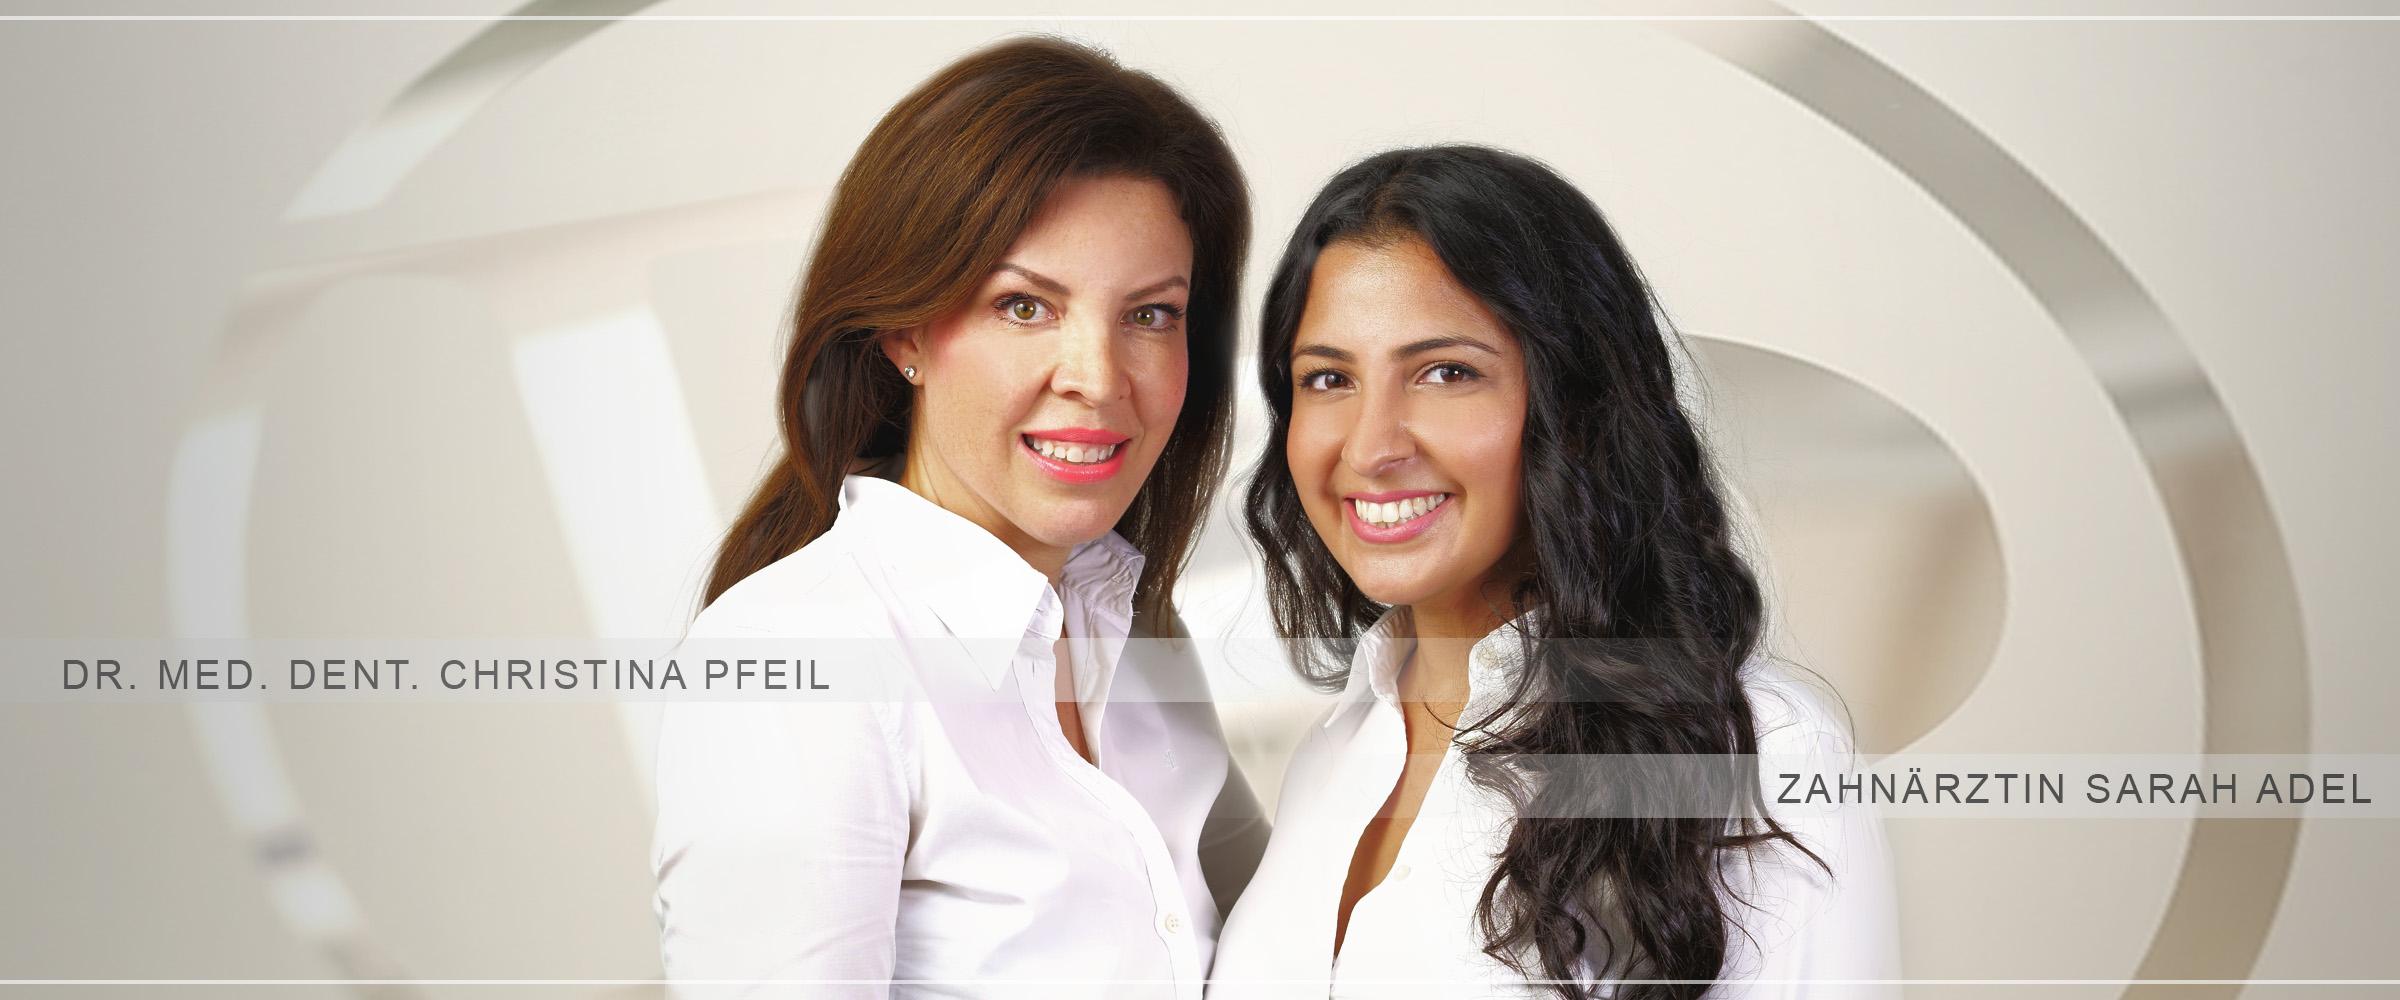 Christina Pfeil & Sarah Adel 01